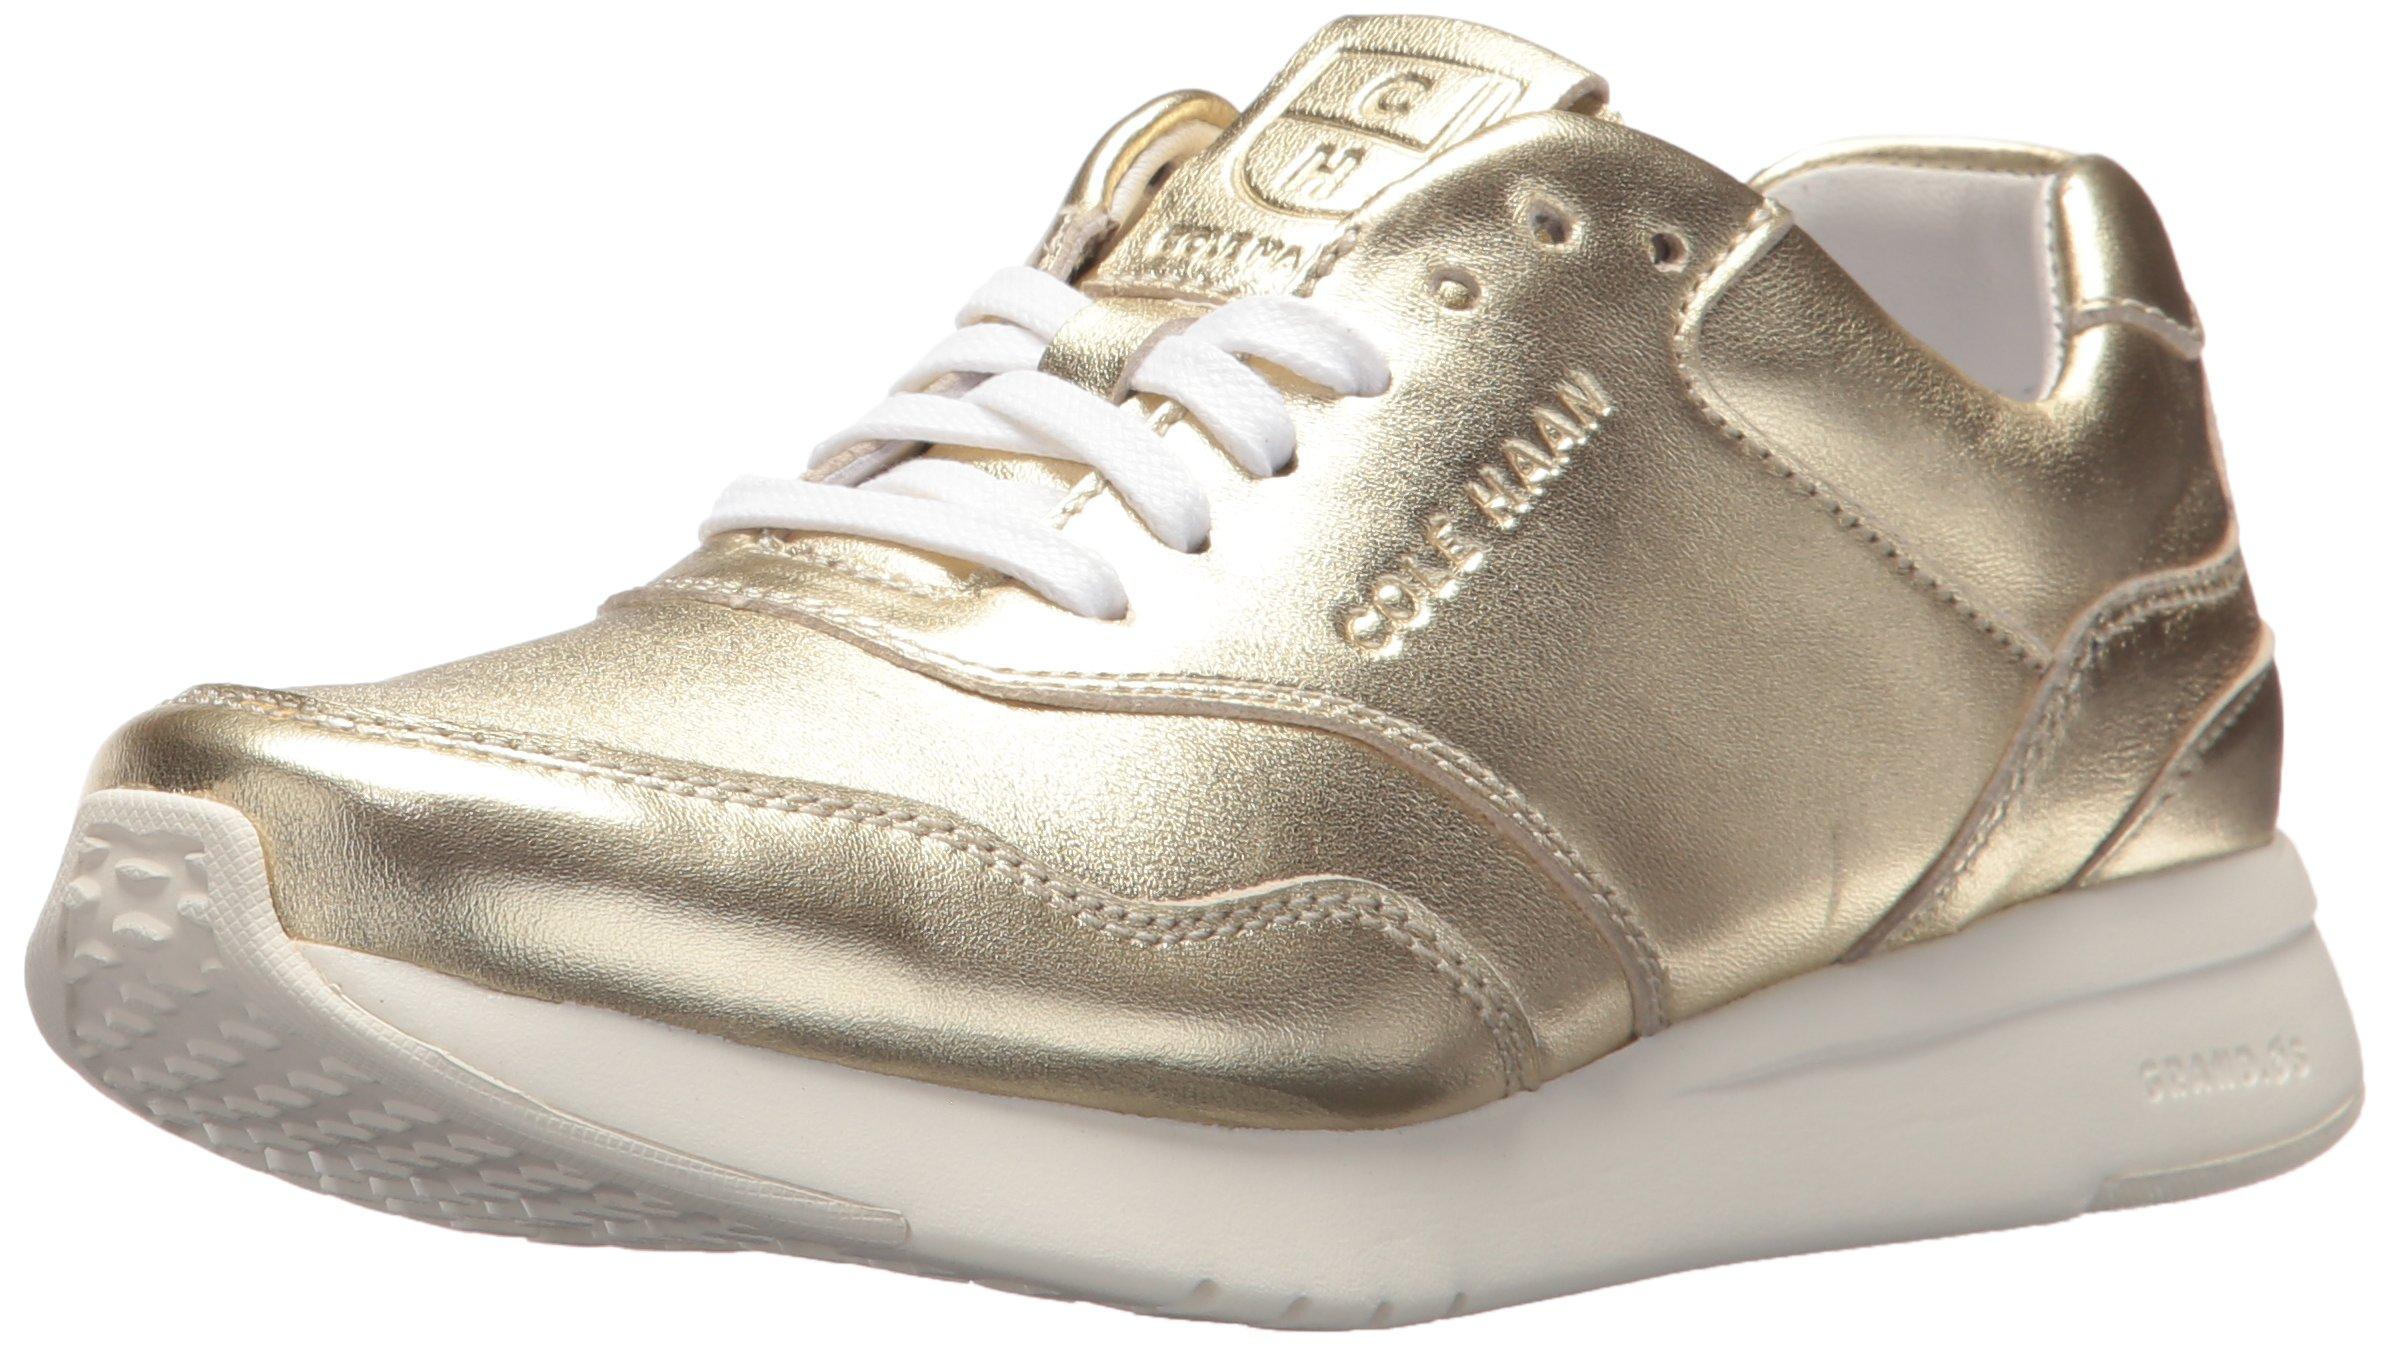 Cole Haan Women's Grandpro Runner, Metallic Soft Gold, 9 B US